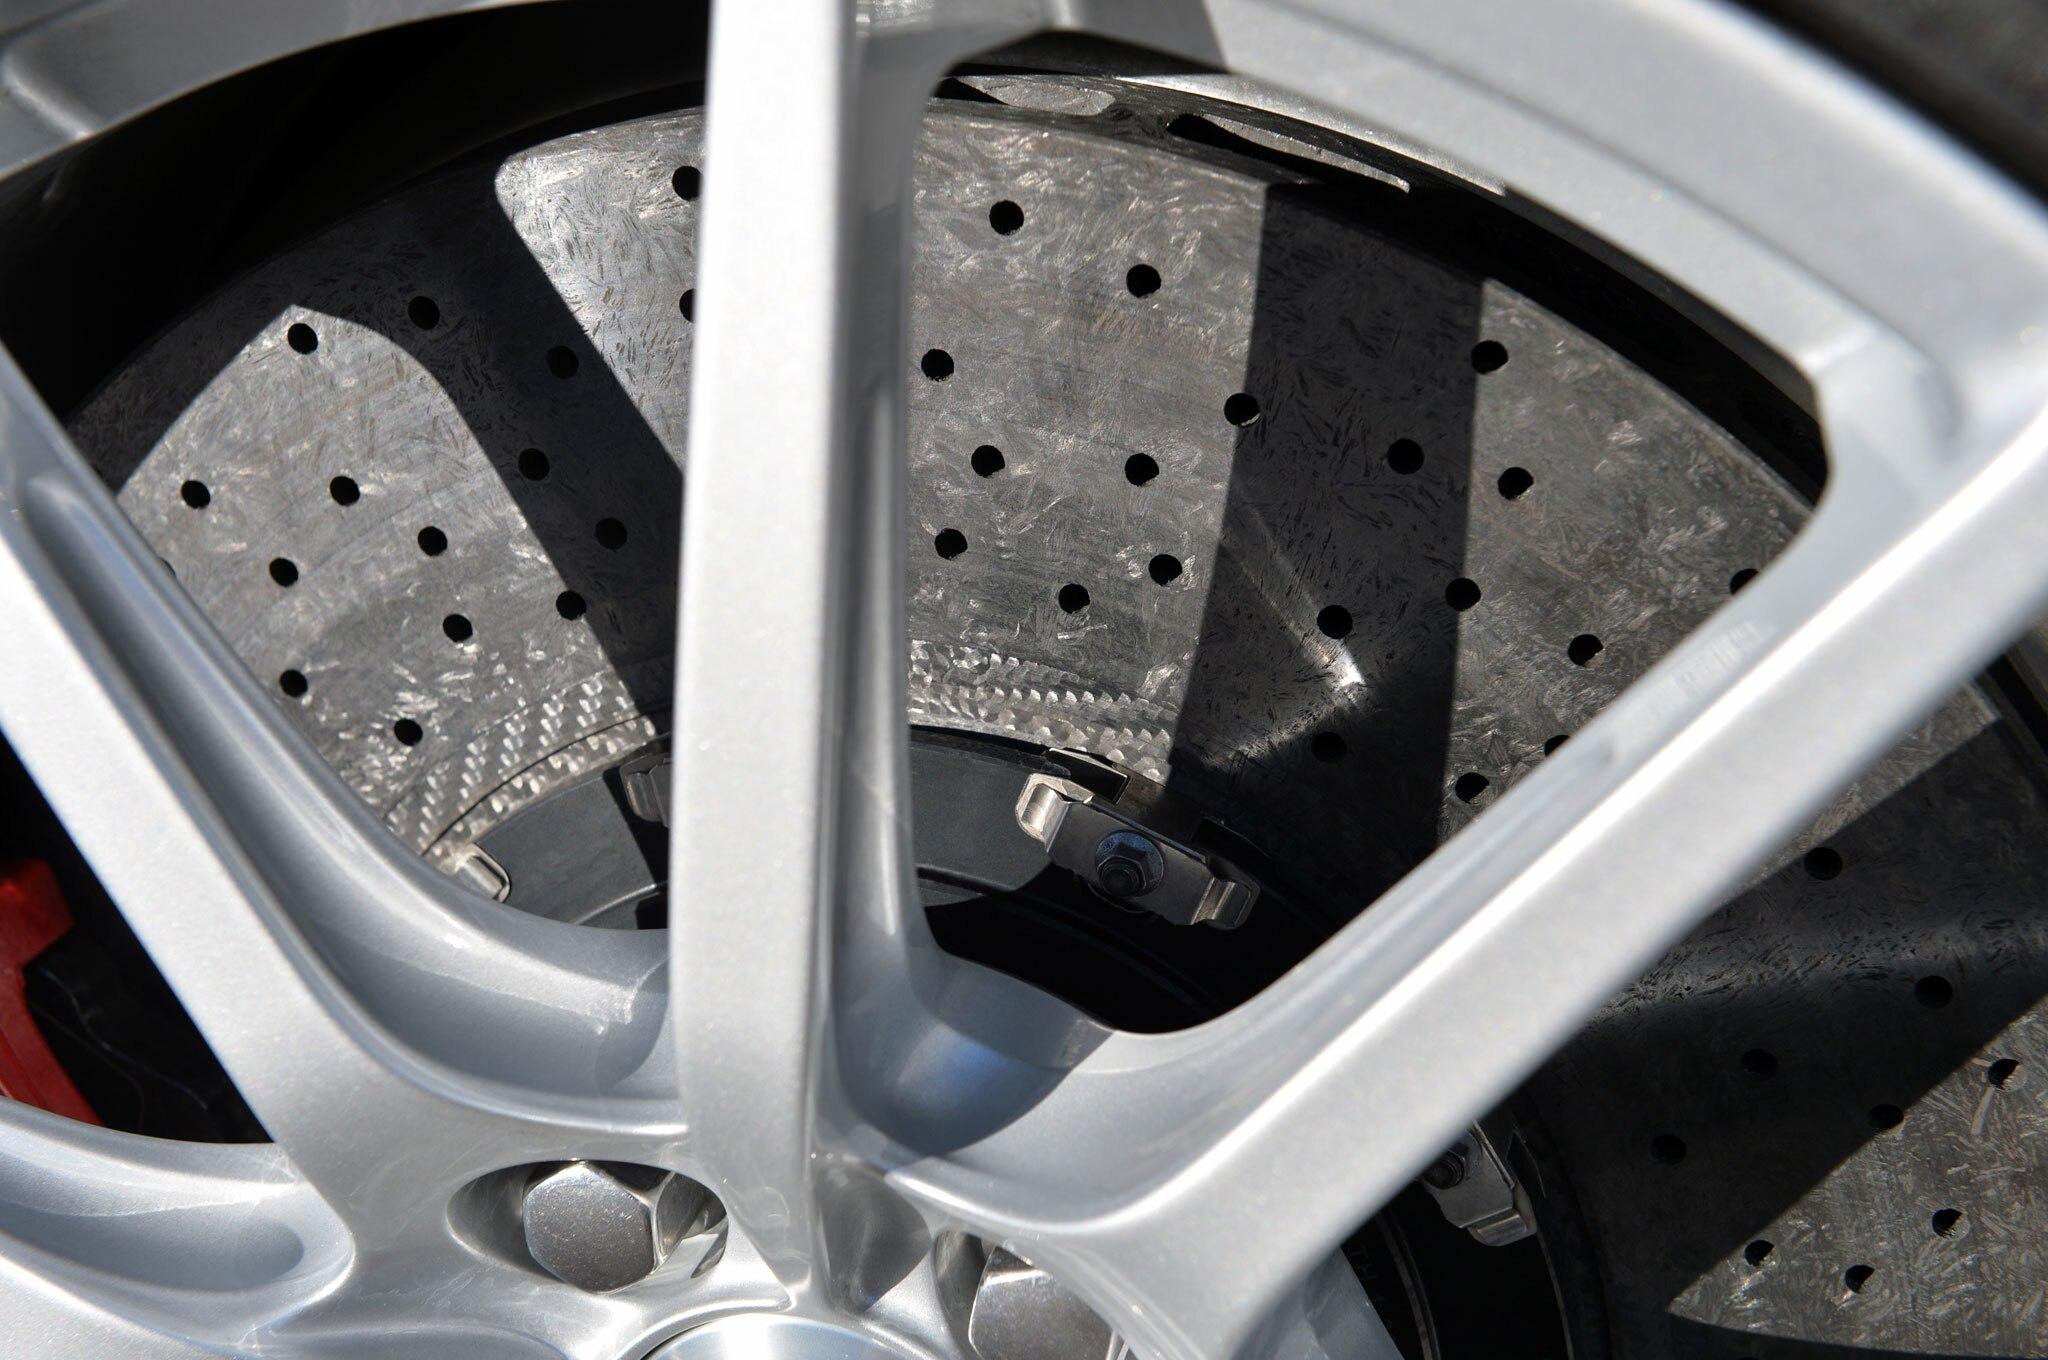 Aston Martin V Vantage S Roadster Wheel Rim Detail on Driven 2015 Aston Martin V12 Vantage S Roadster Review